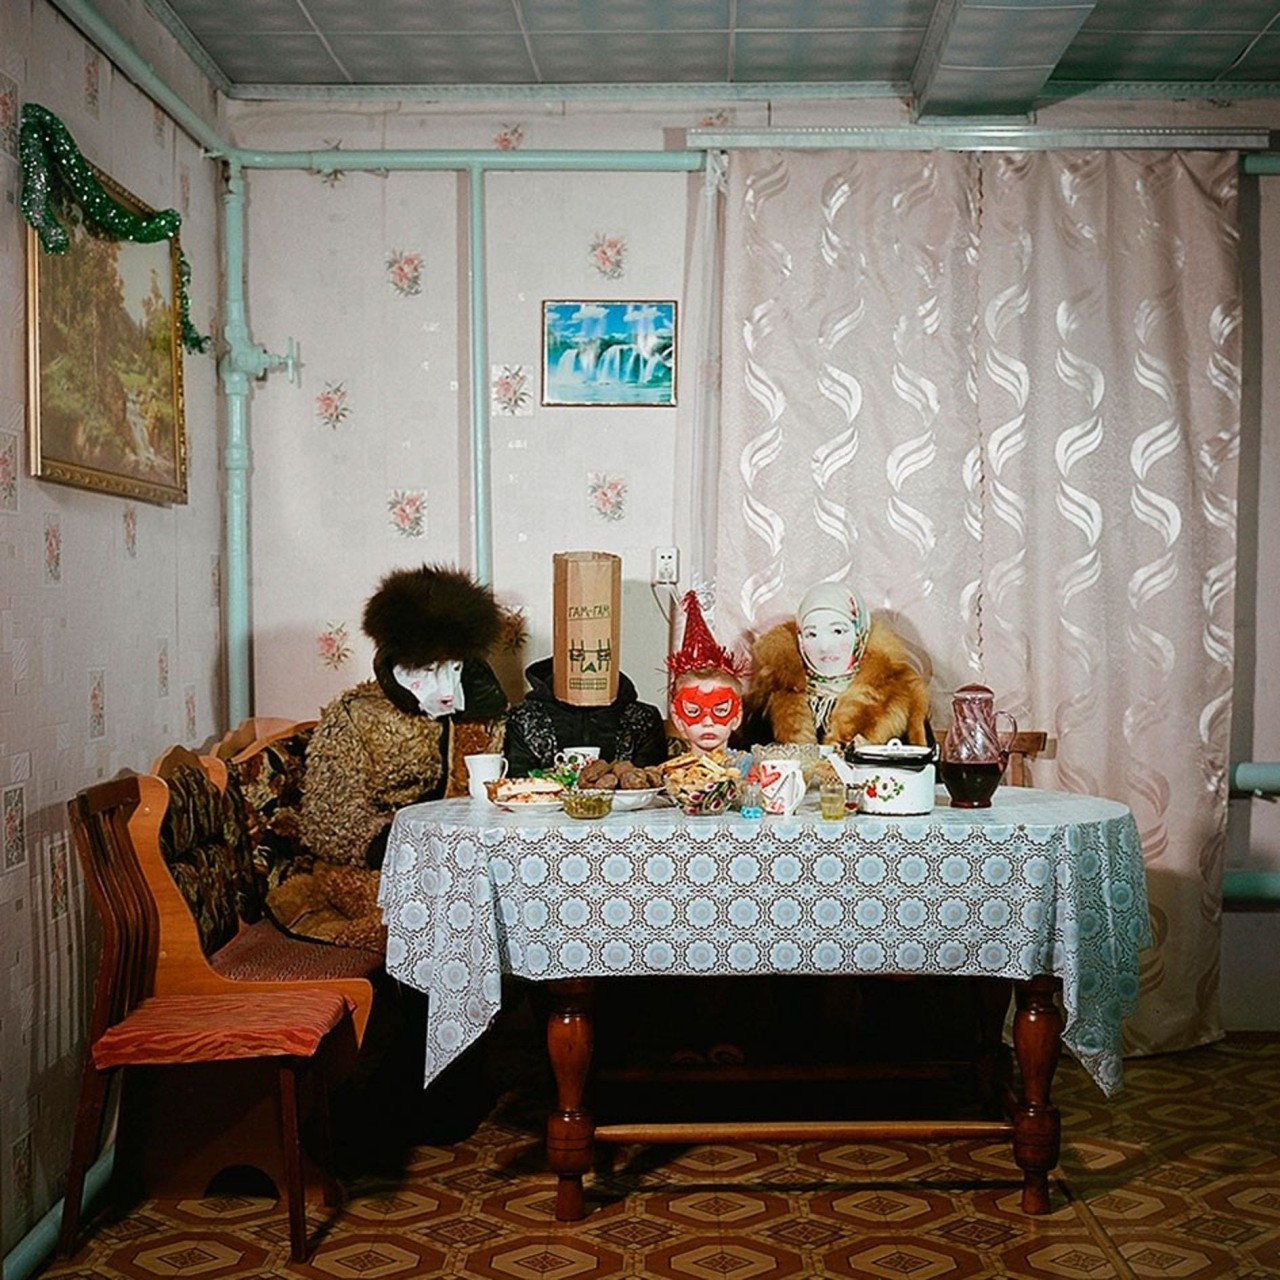 Фото: Альбина Шаймуратова